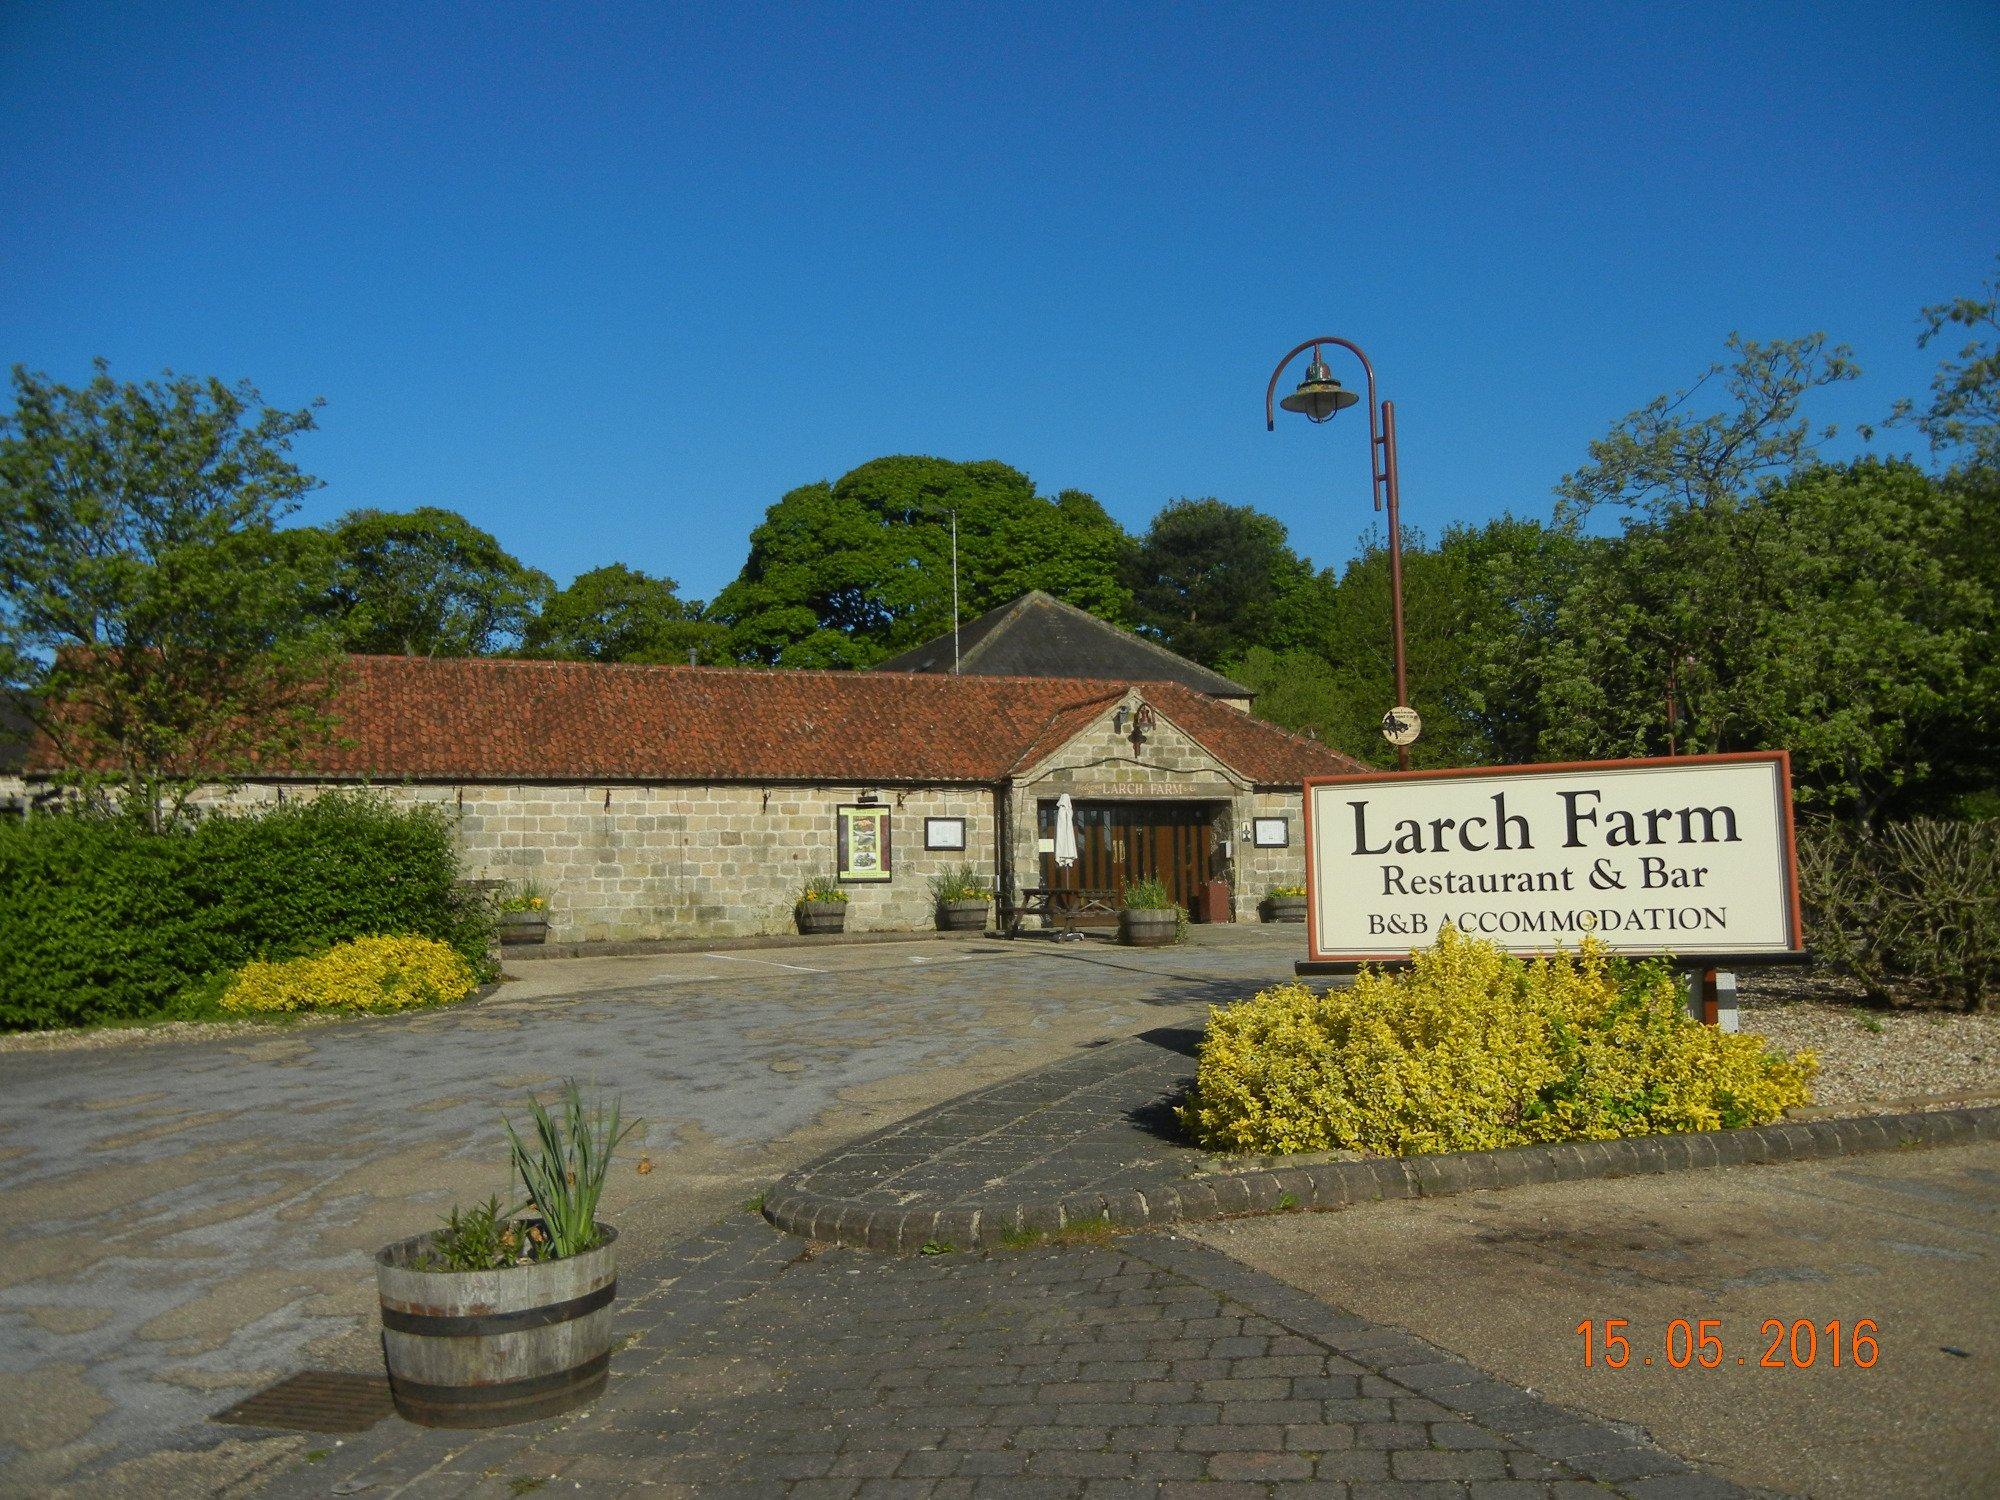 Larch Farm